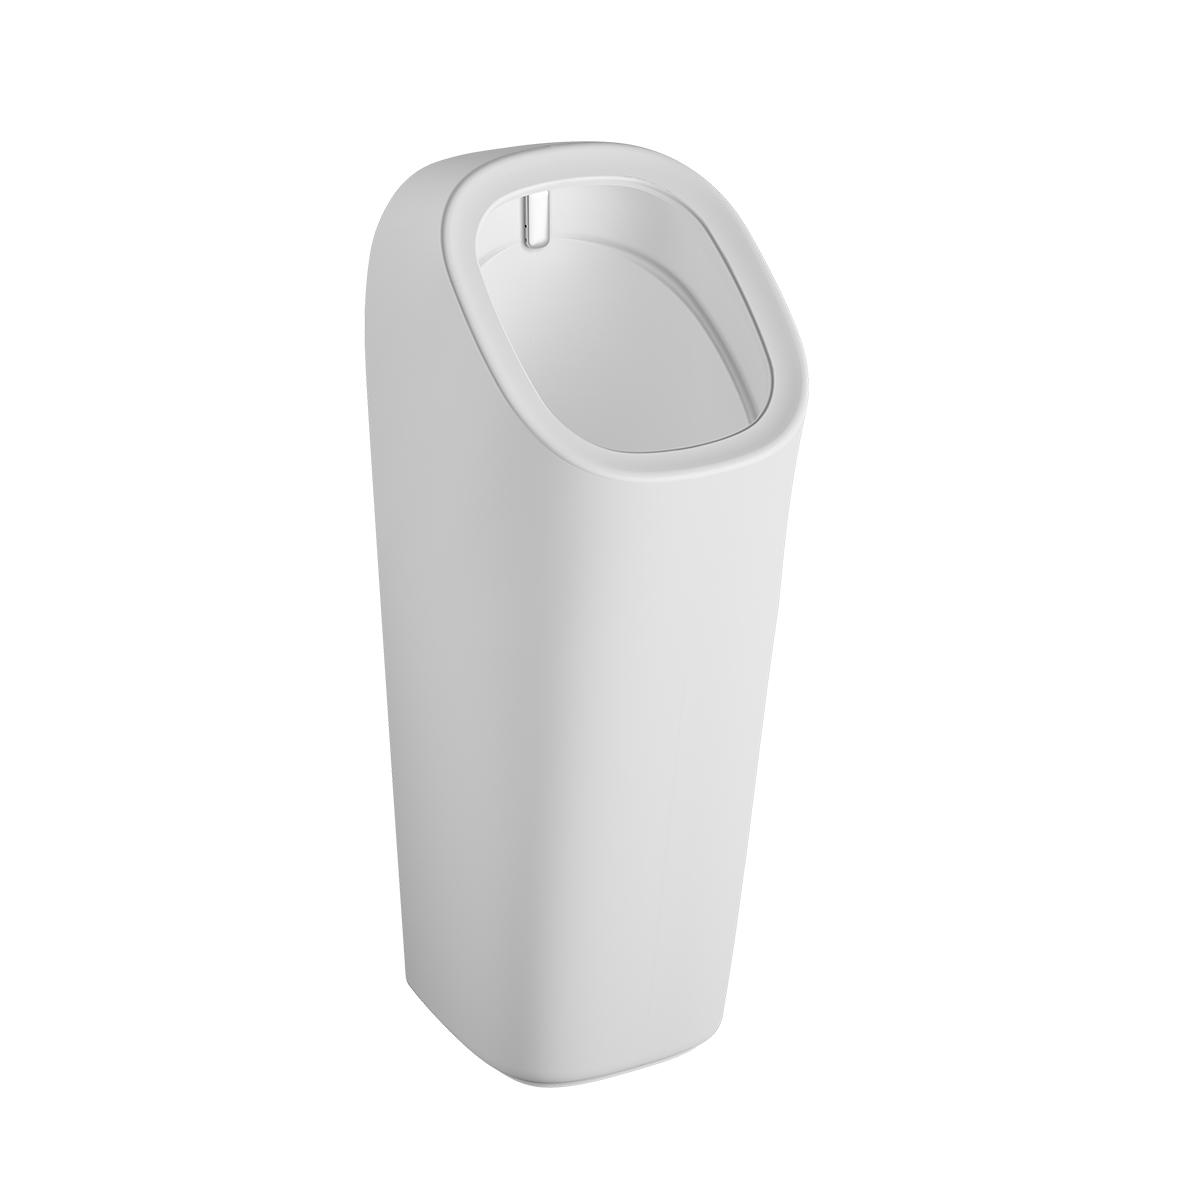 Plural Monoblock Urinal Wandmontage Netzanschluss (230 V), Edelweiß